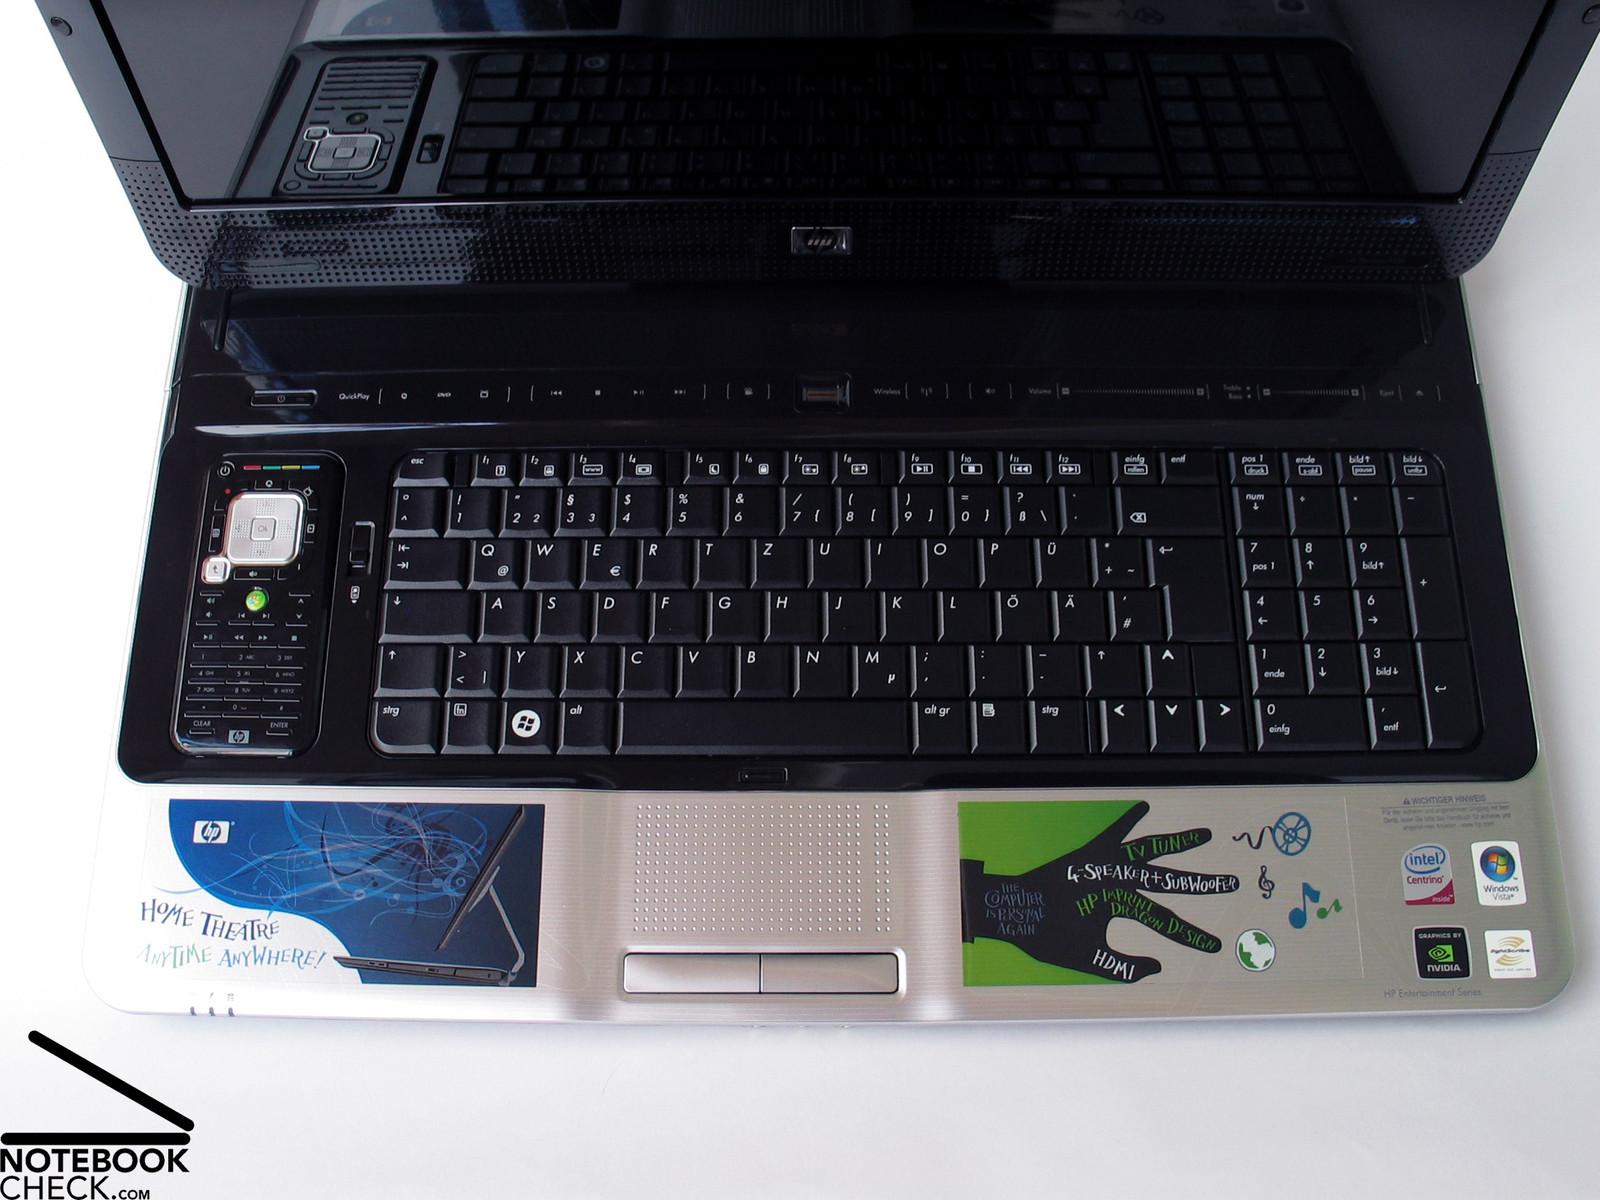 HP PAVILION HDX9200 TREIBER